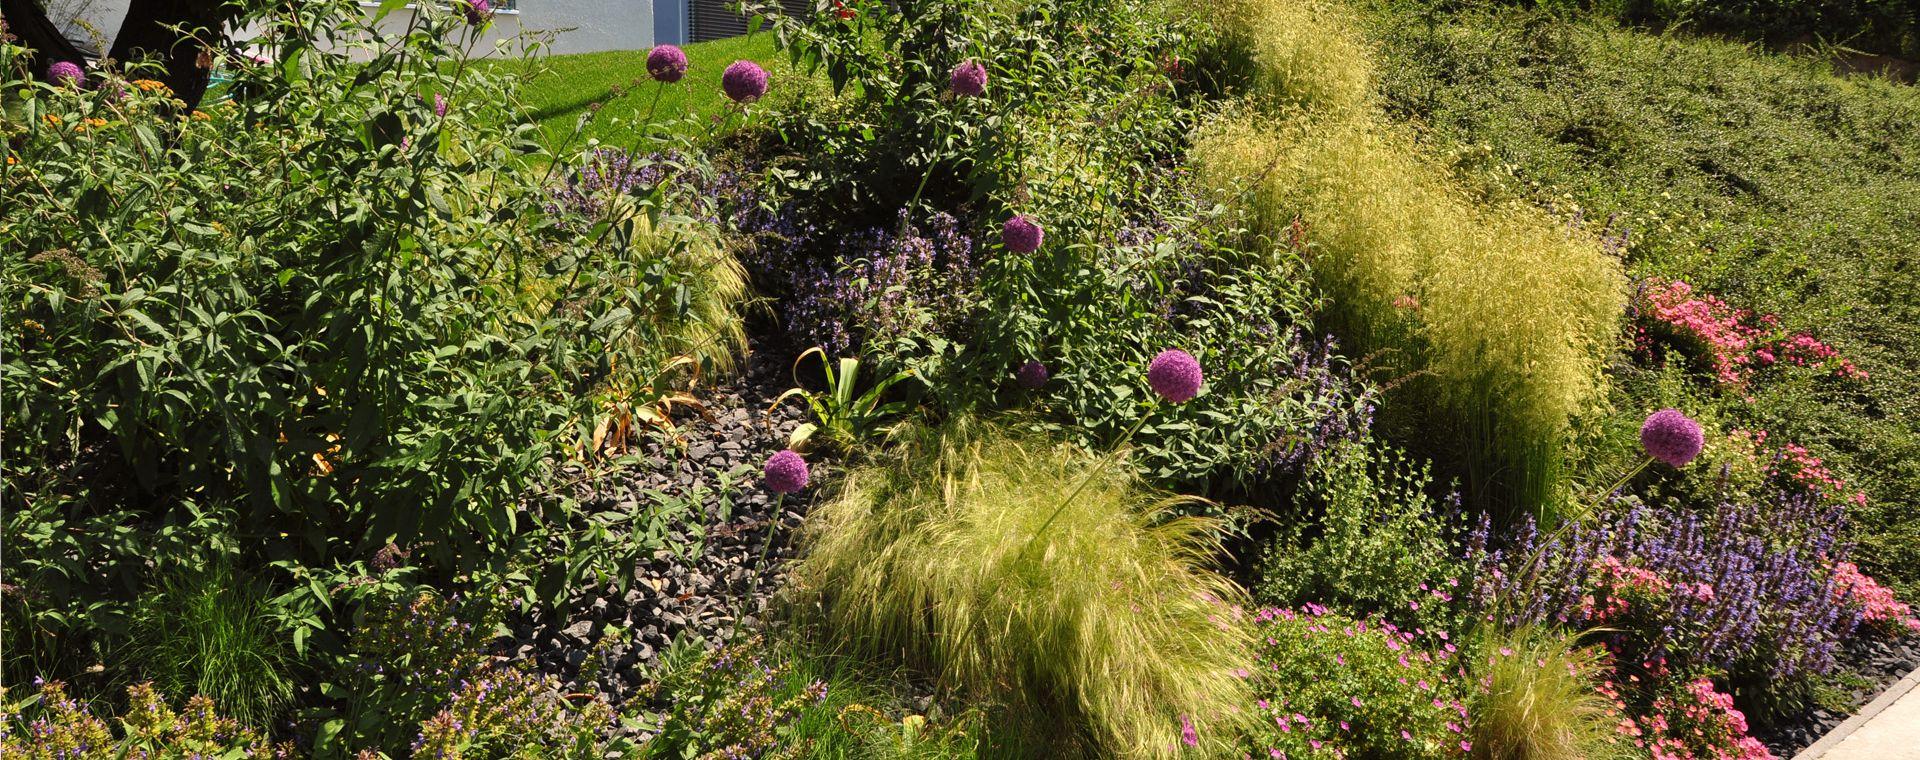 Perennial flower bed Záhorská Bystrica, 2012, SK